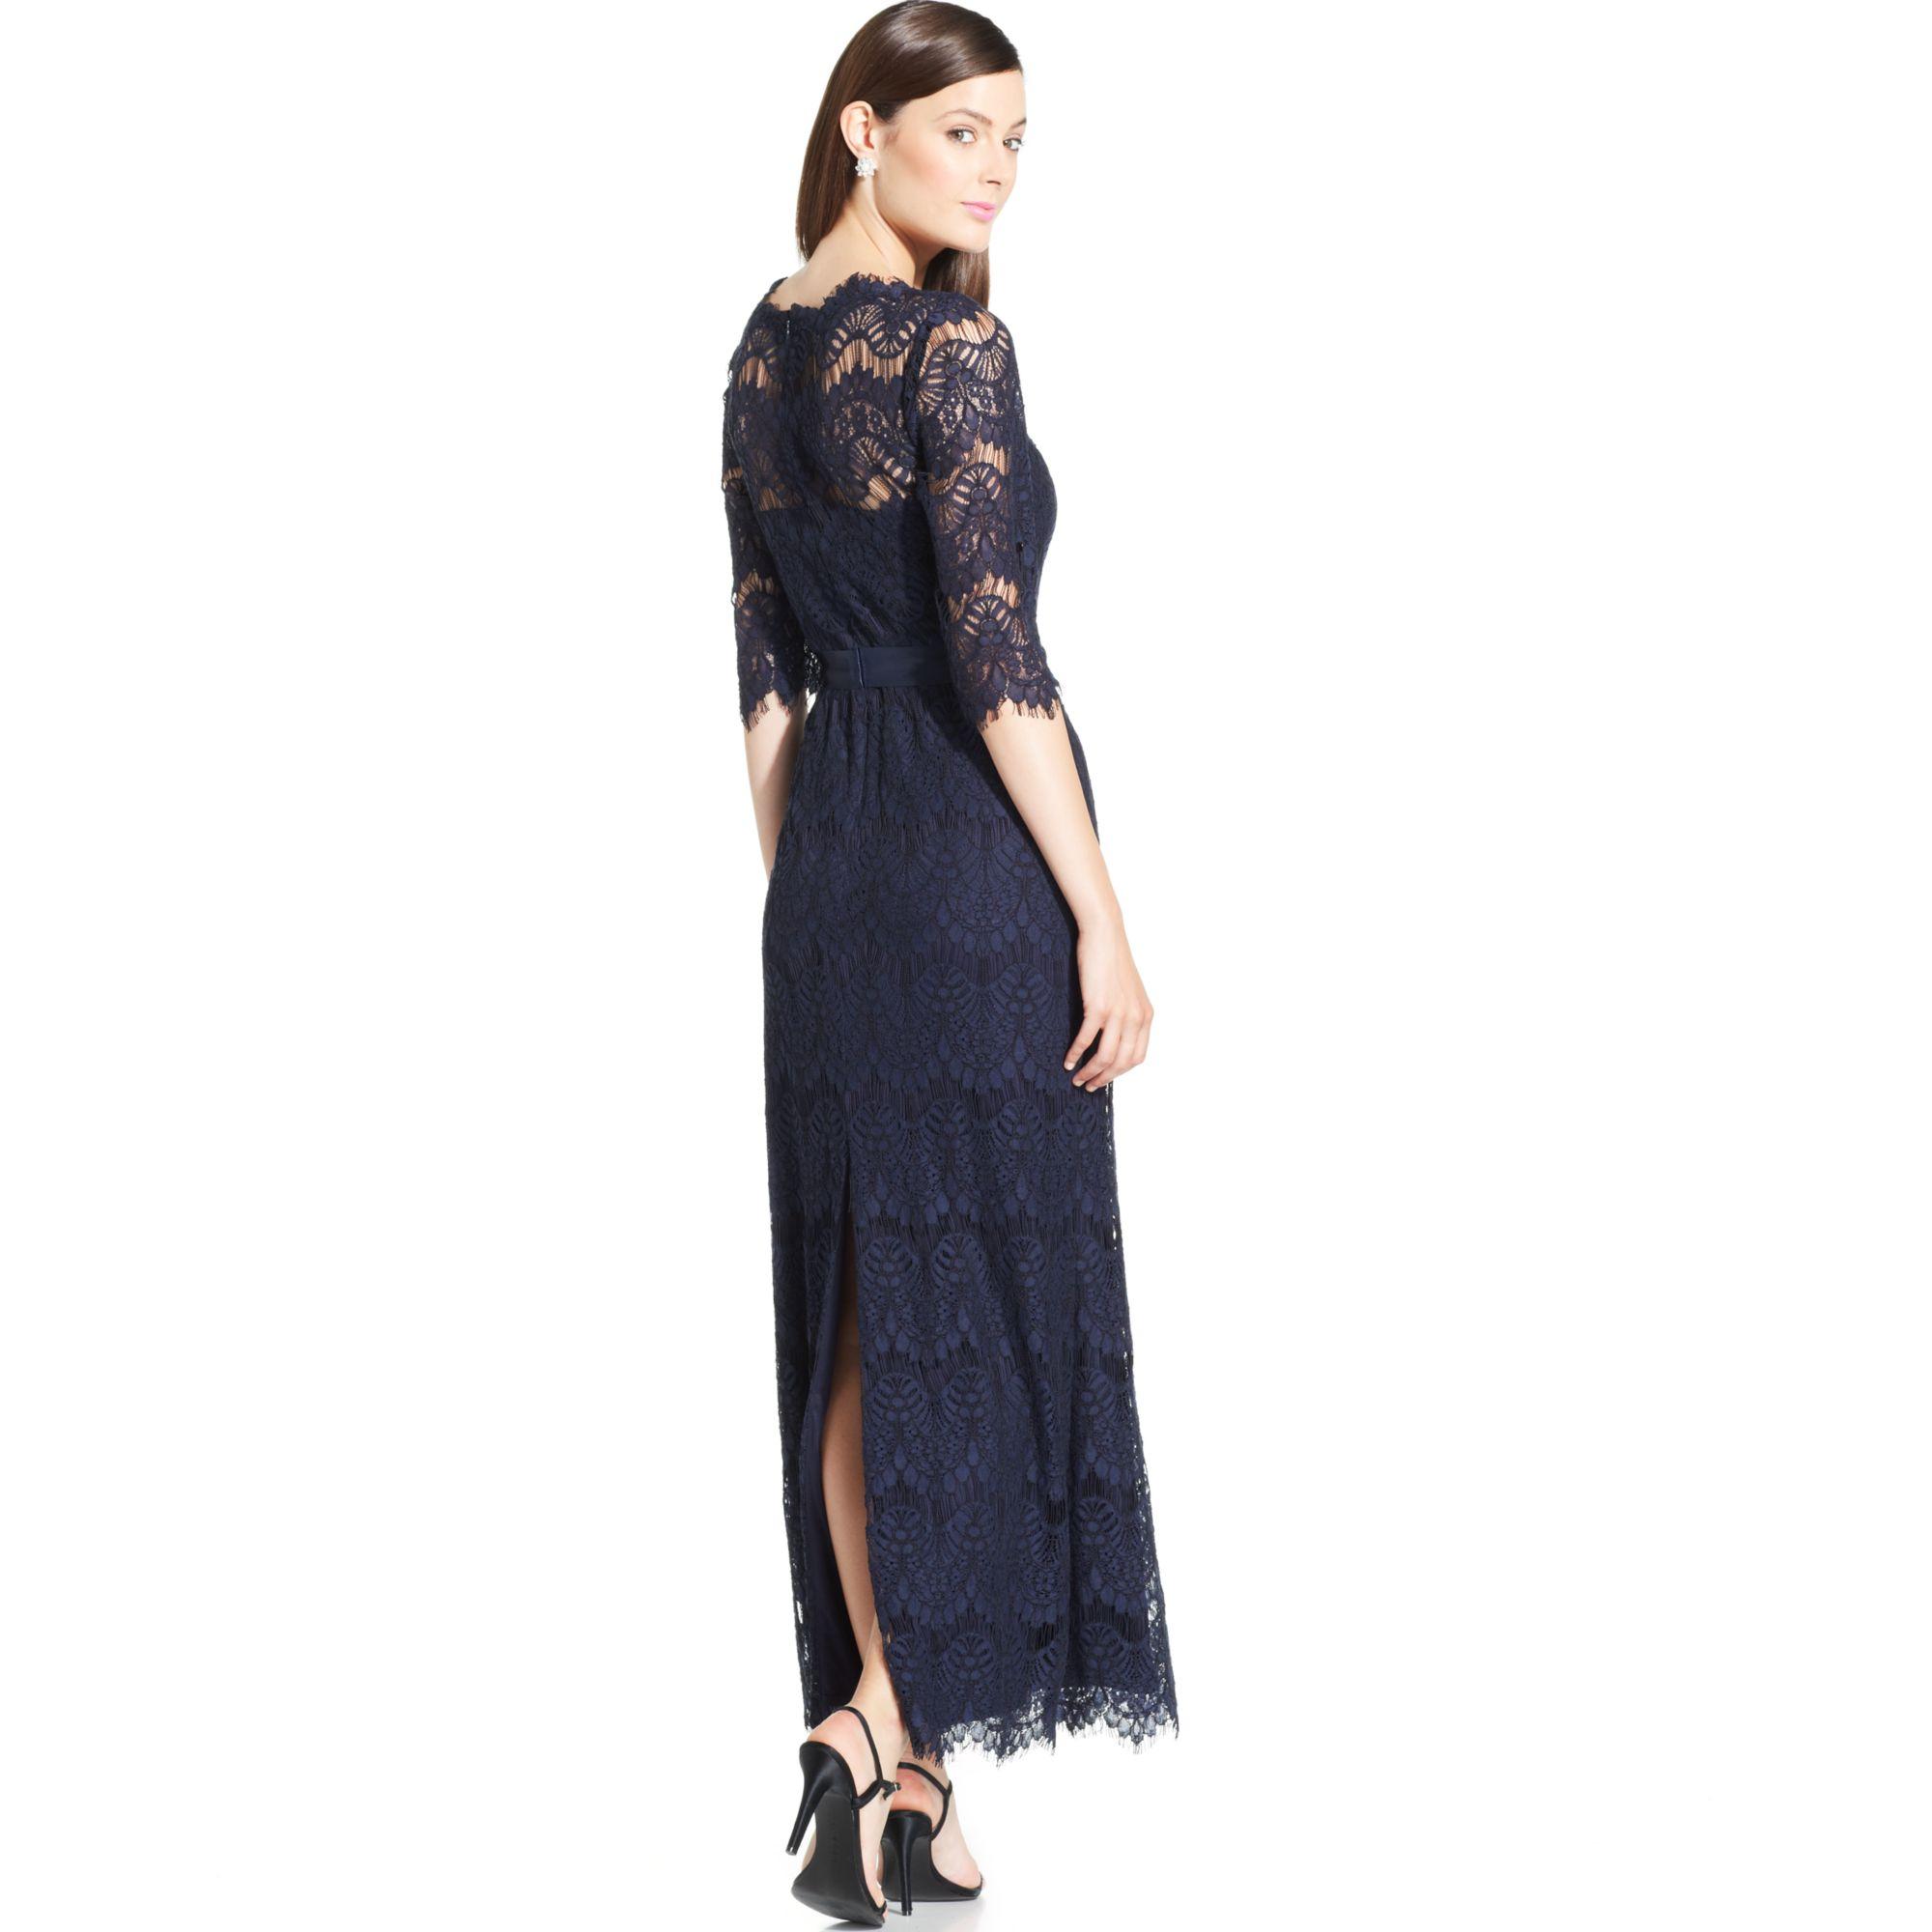 Turmec » xscape sleeveless illusion lace dress